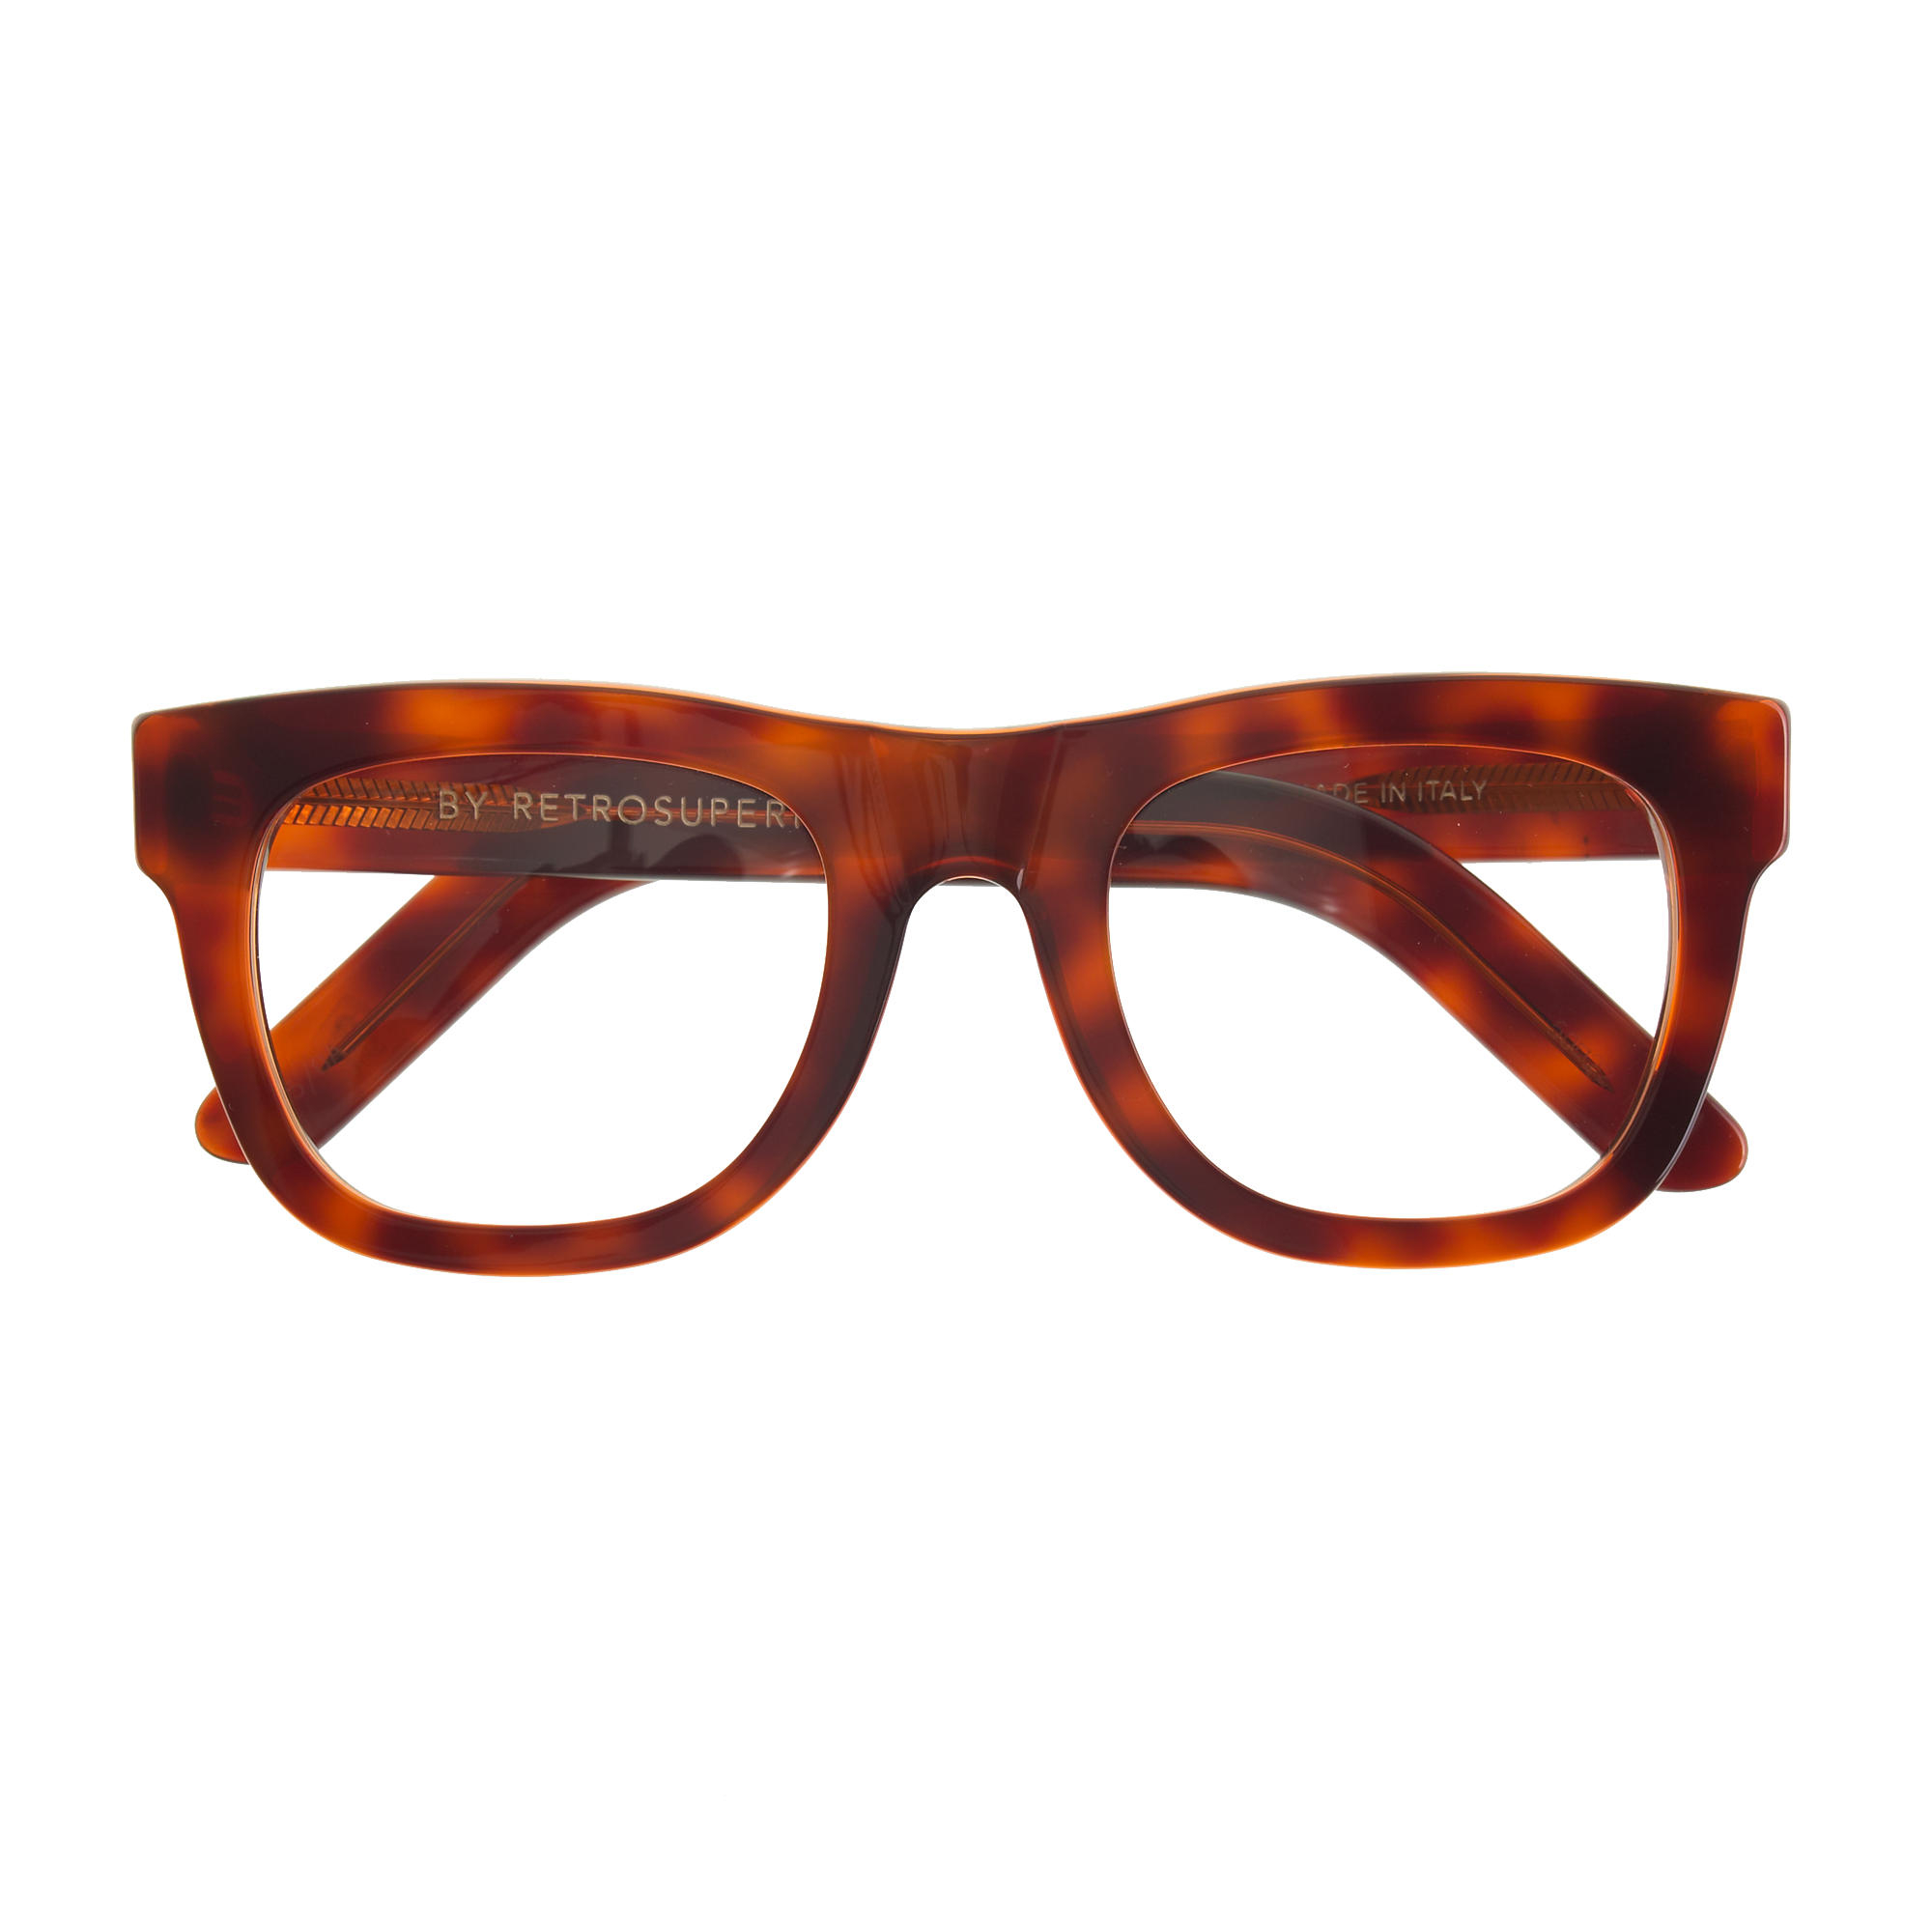 7739f4b00f Lyst - J.Crew Super™ Ciccio Eyeglasses in Brown